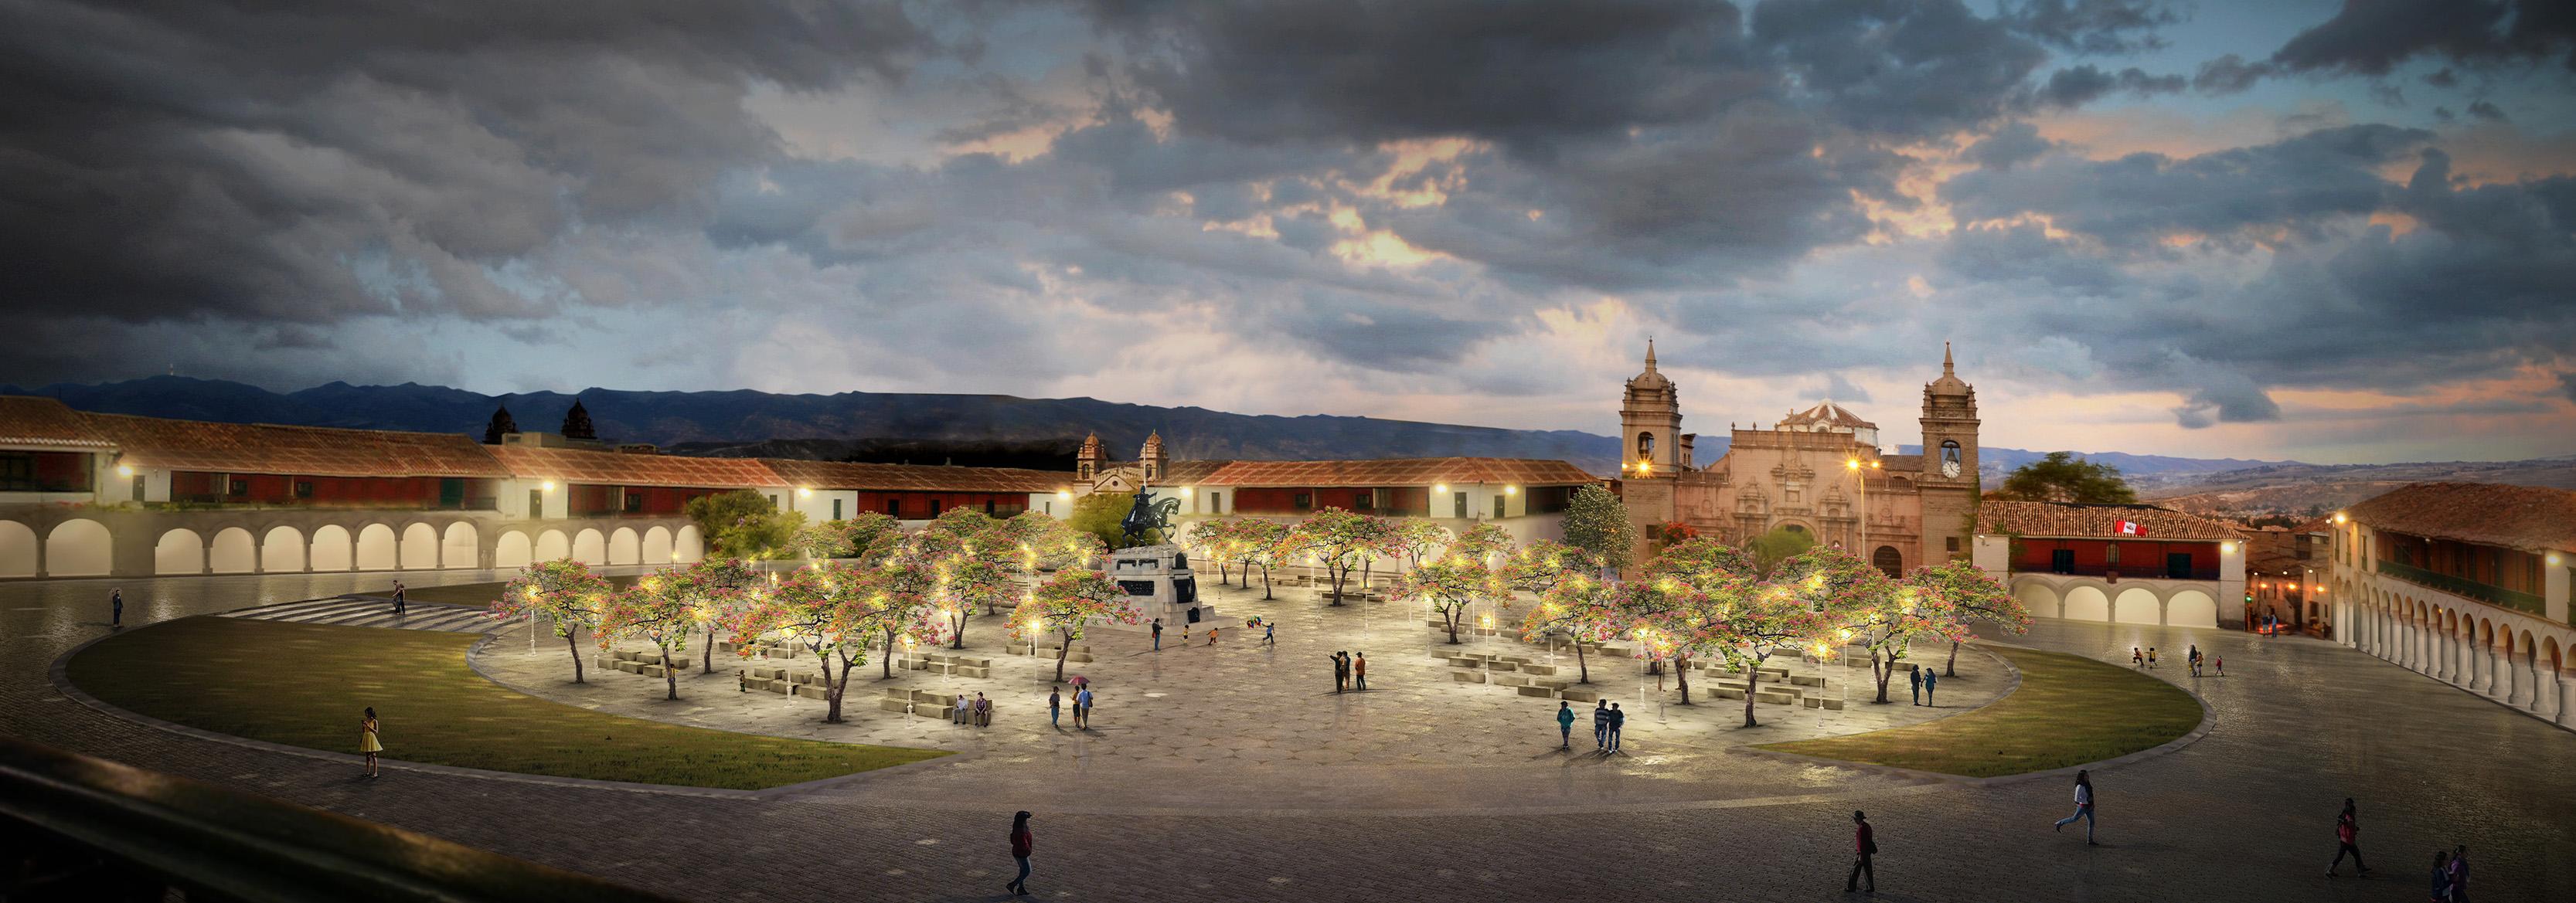 130816 Plaza Mayor